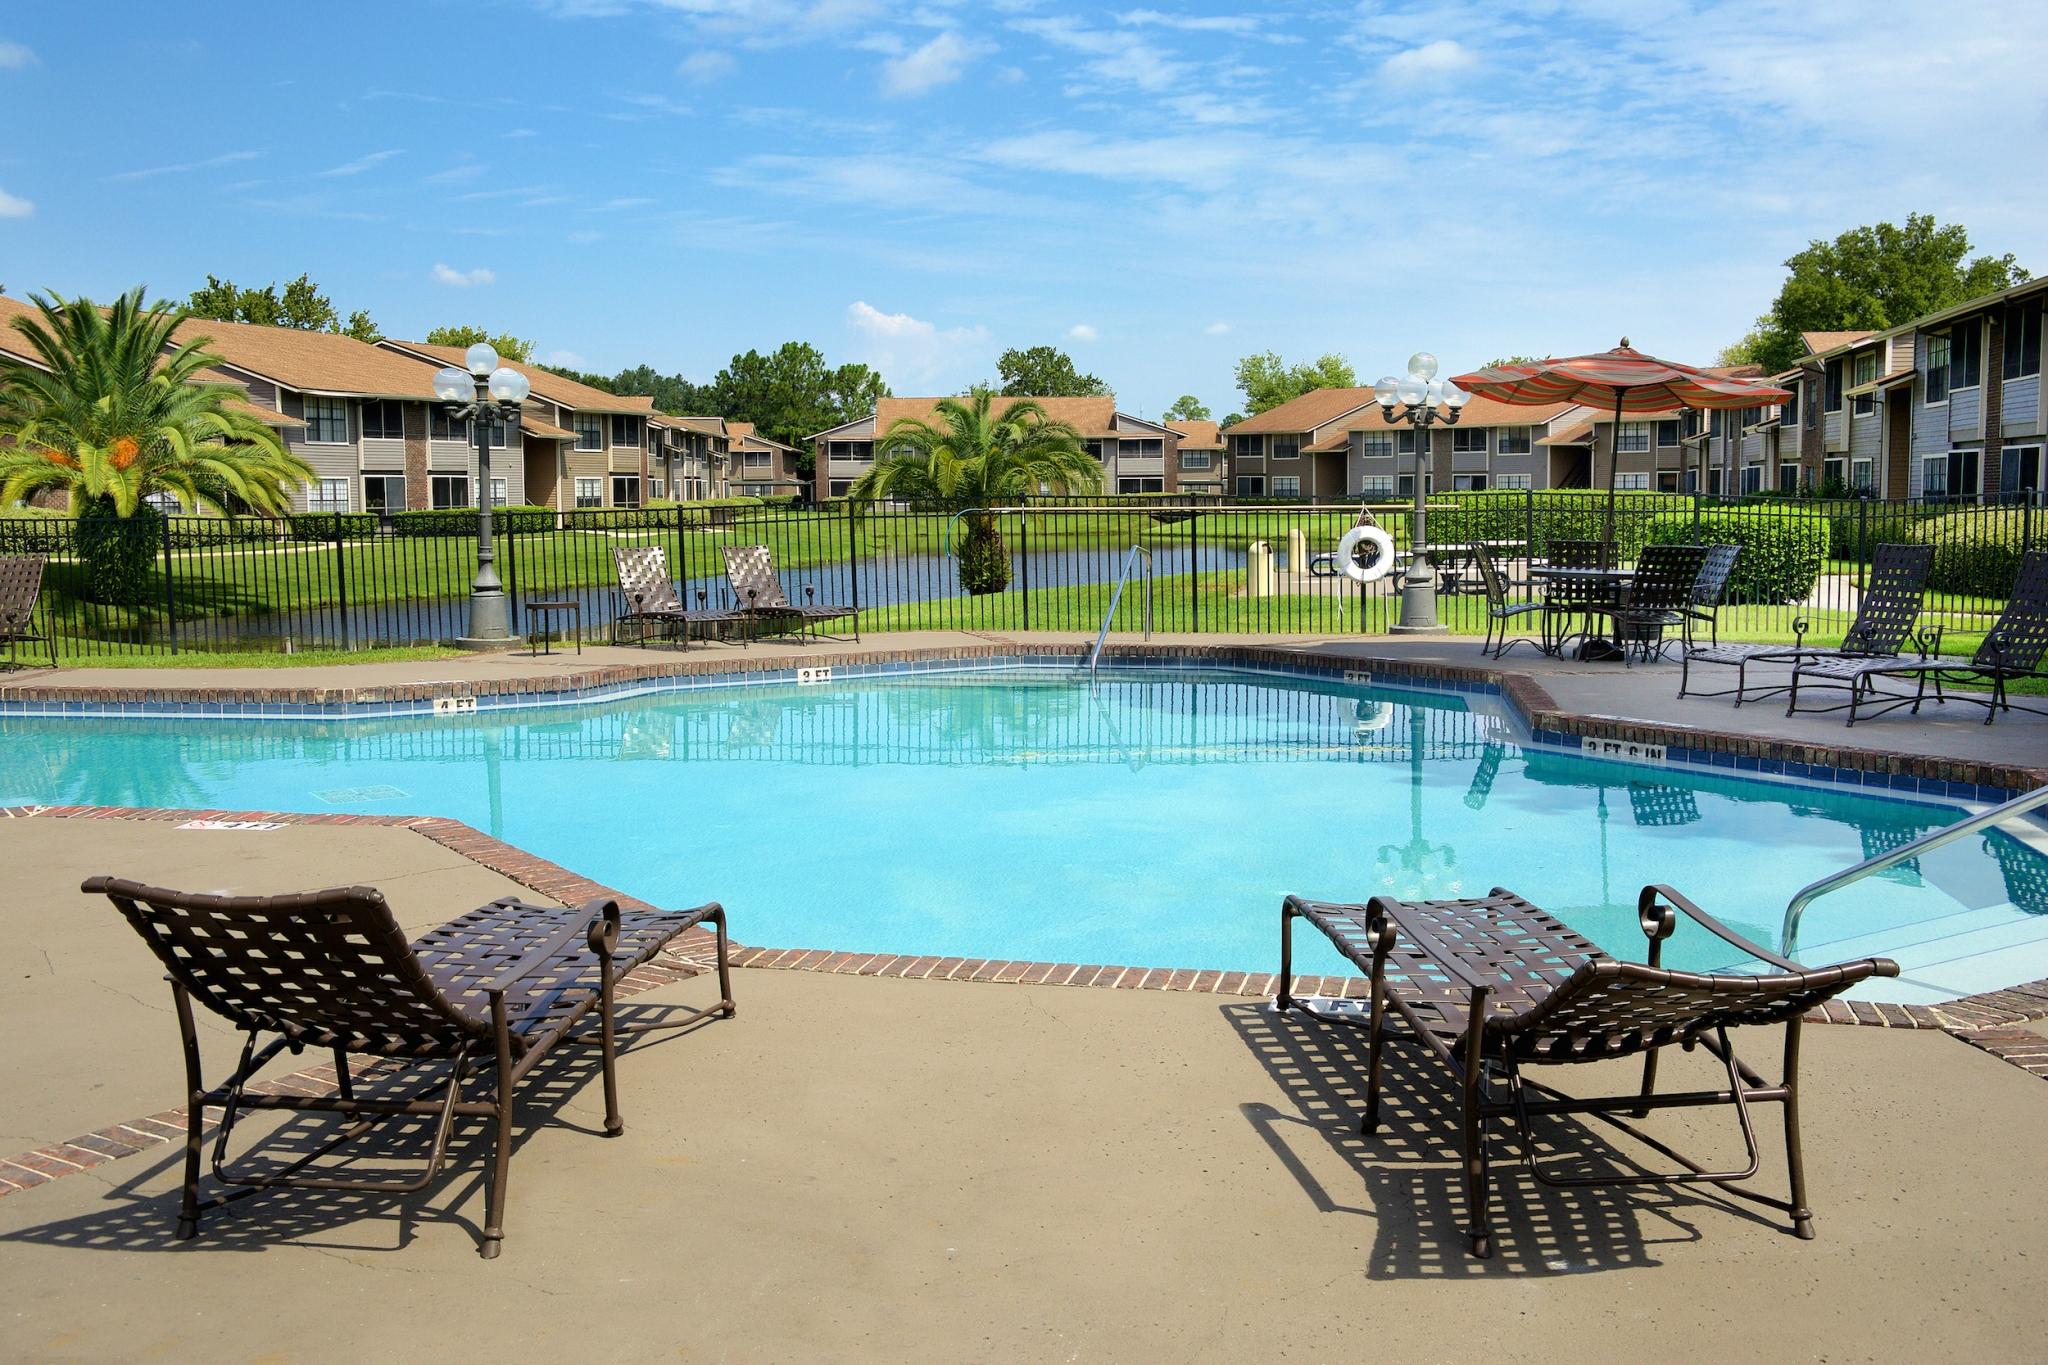 Bentley Green | Apartment Rentals Jacksonville, FL | Swimming Pool